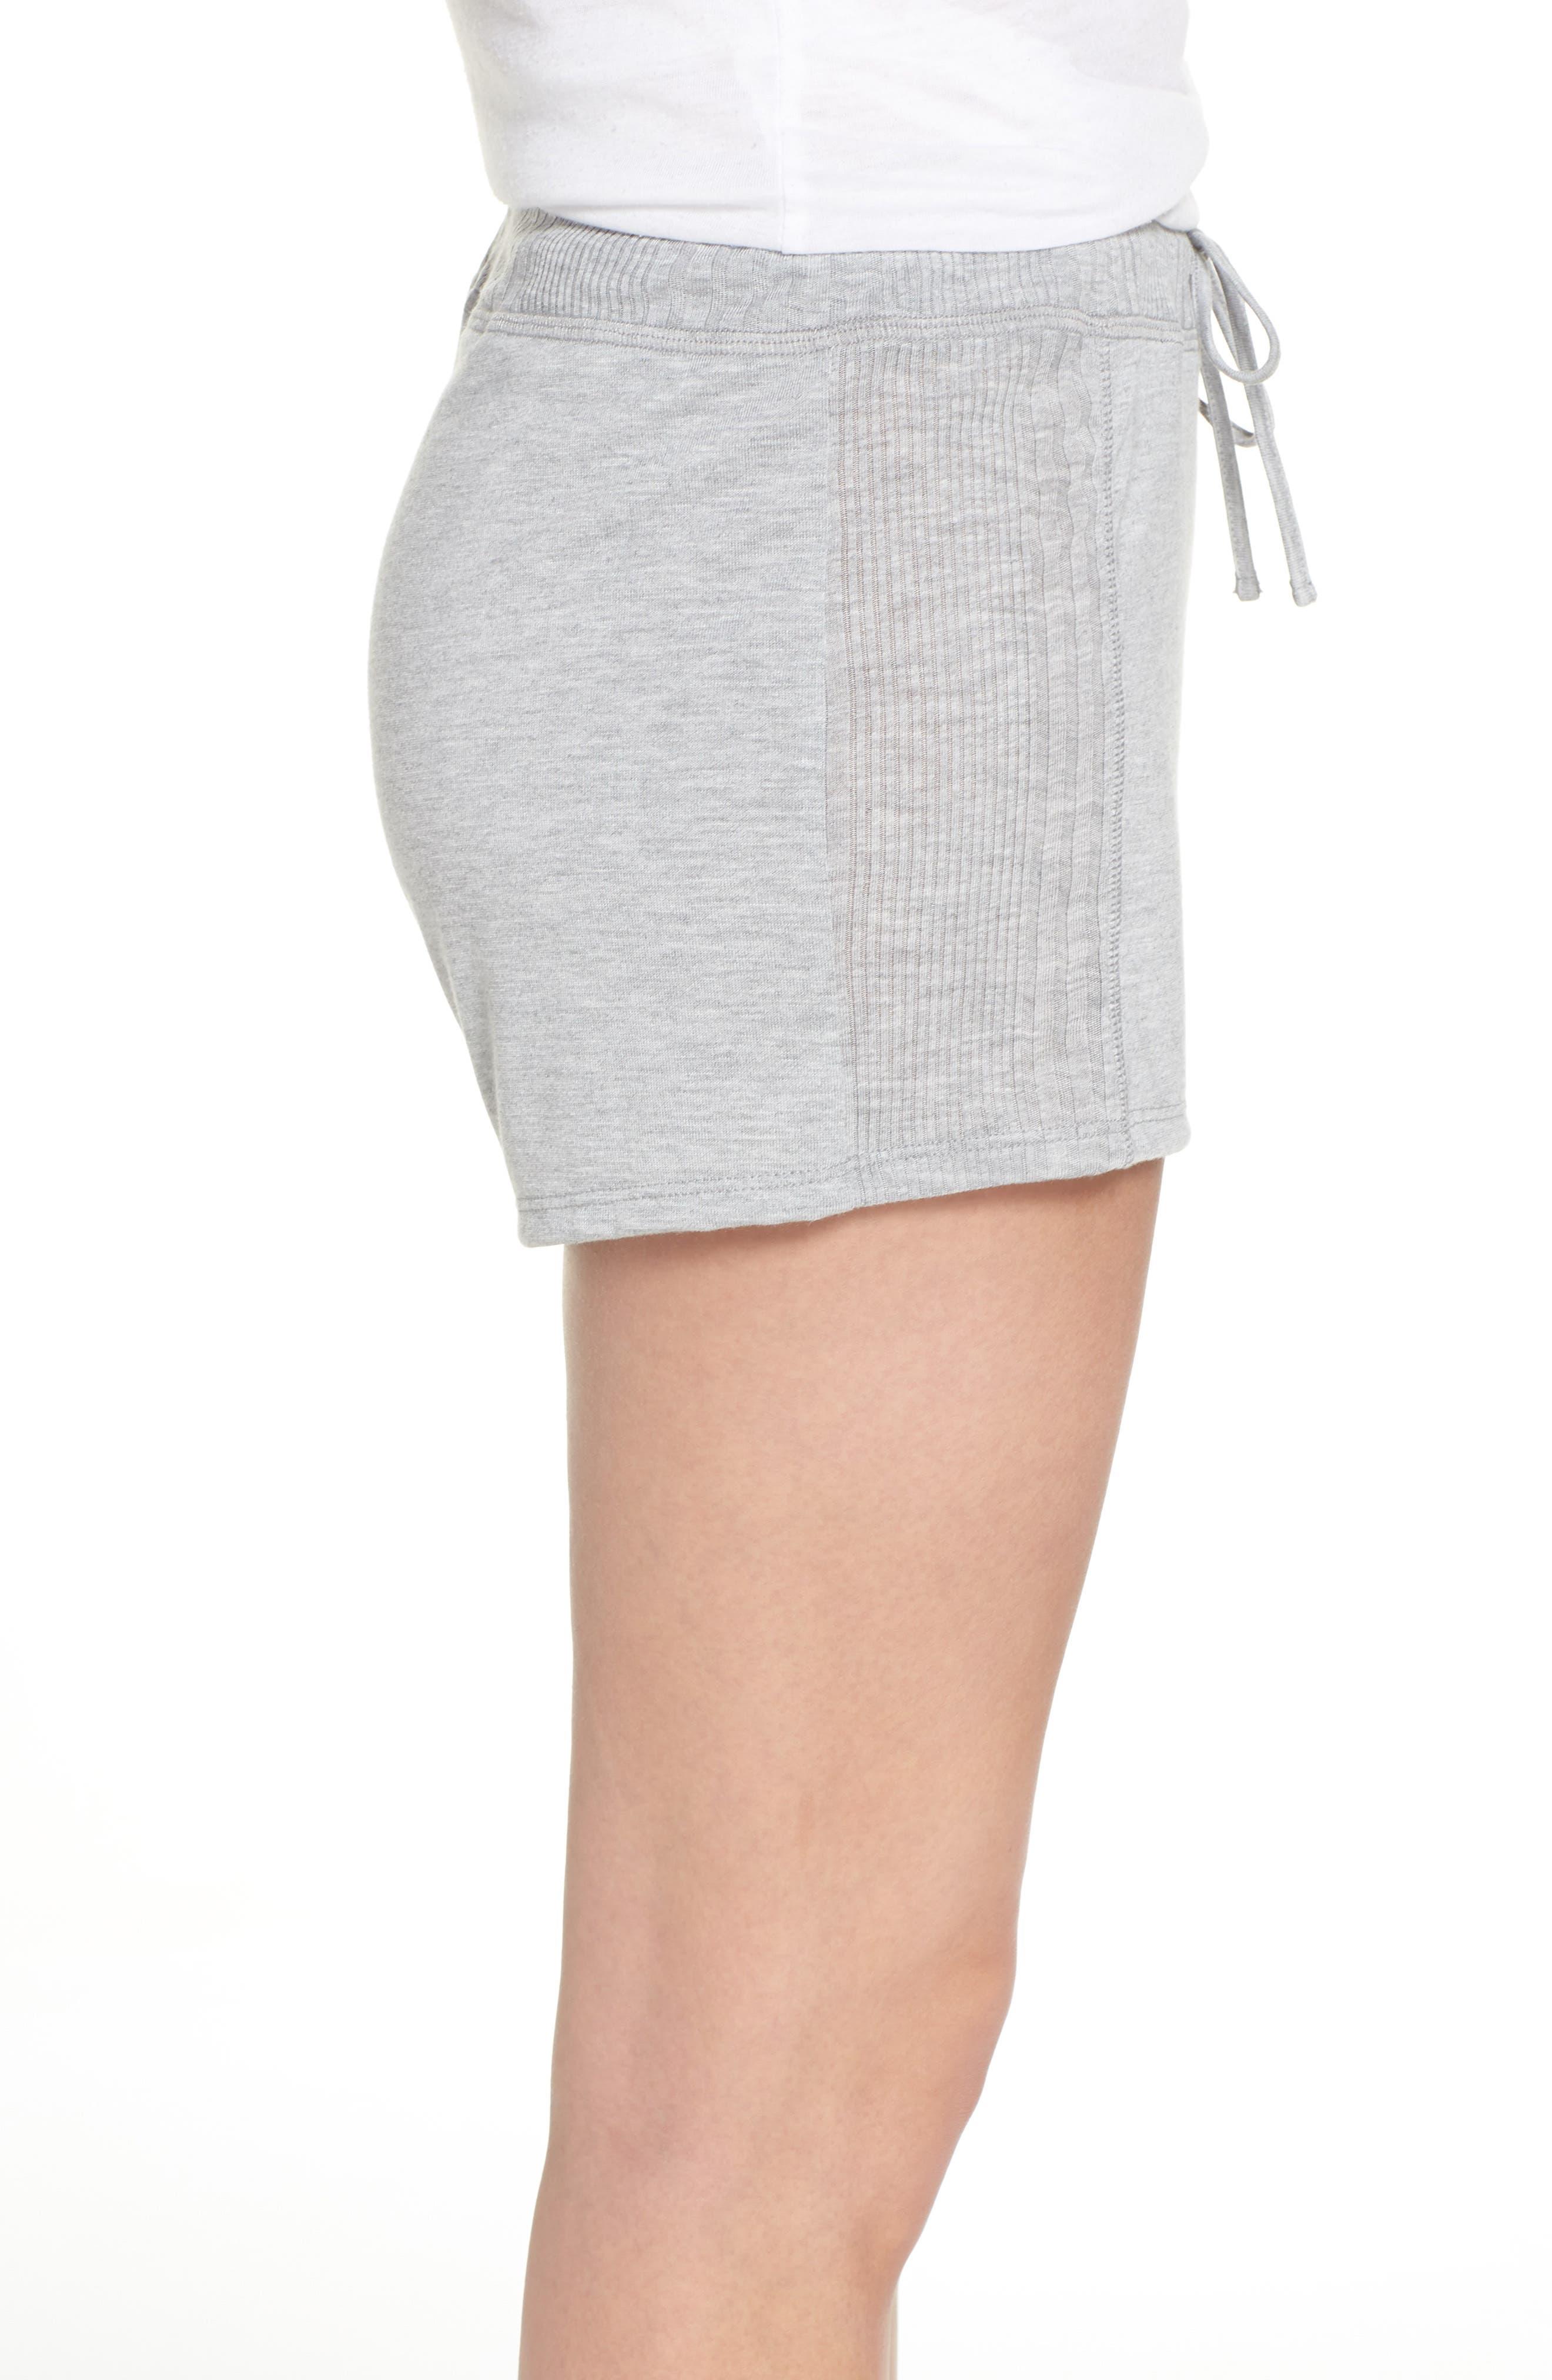 Pajama Shorts,                             Alternate thumbnail 3, color,                             LIGHT HEATHER GREY